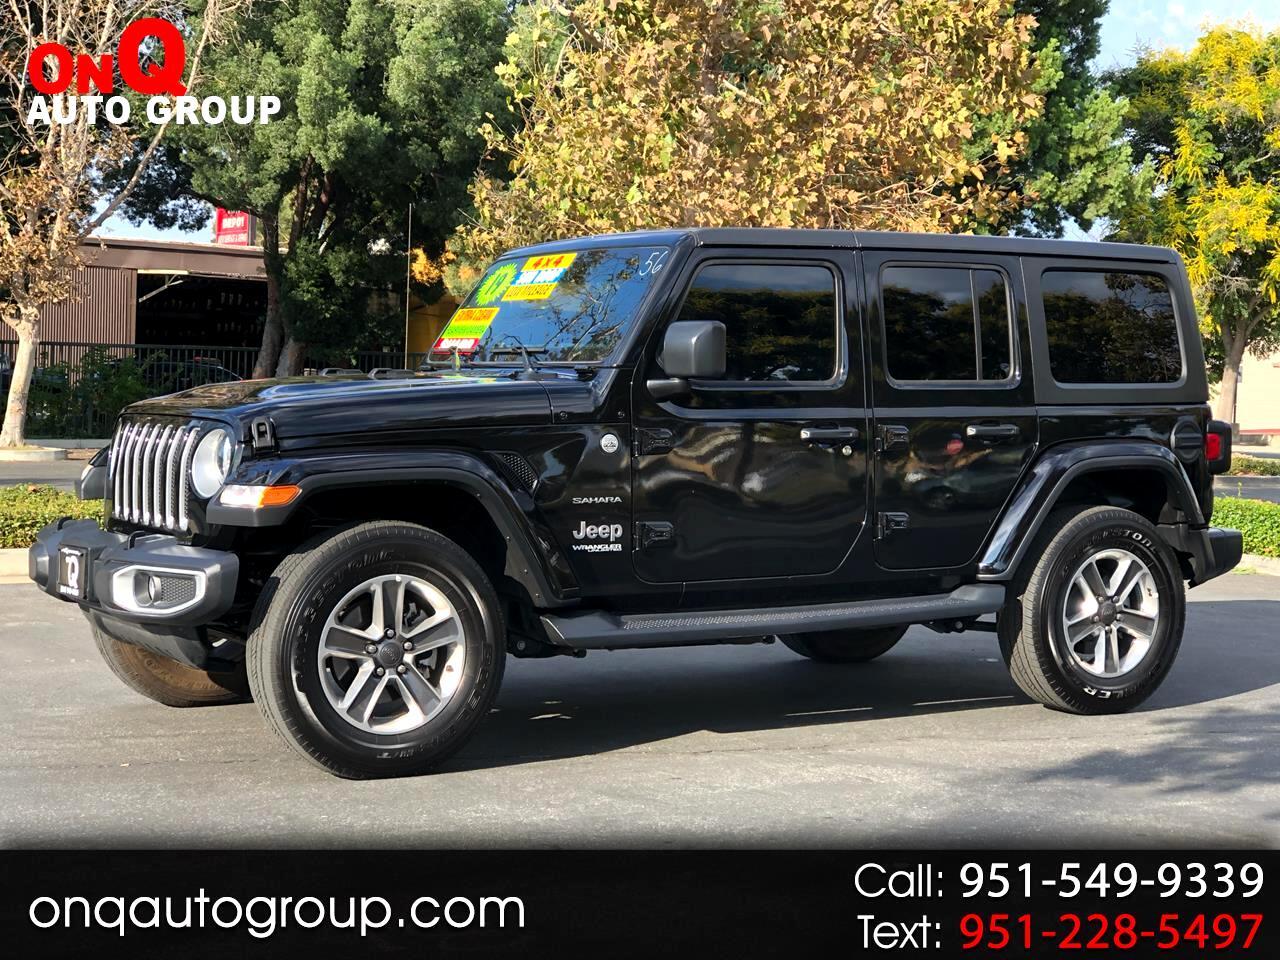 2019 Jeep Wrangler Unlimited Sahara 4x4